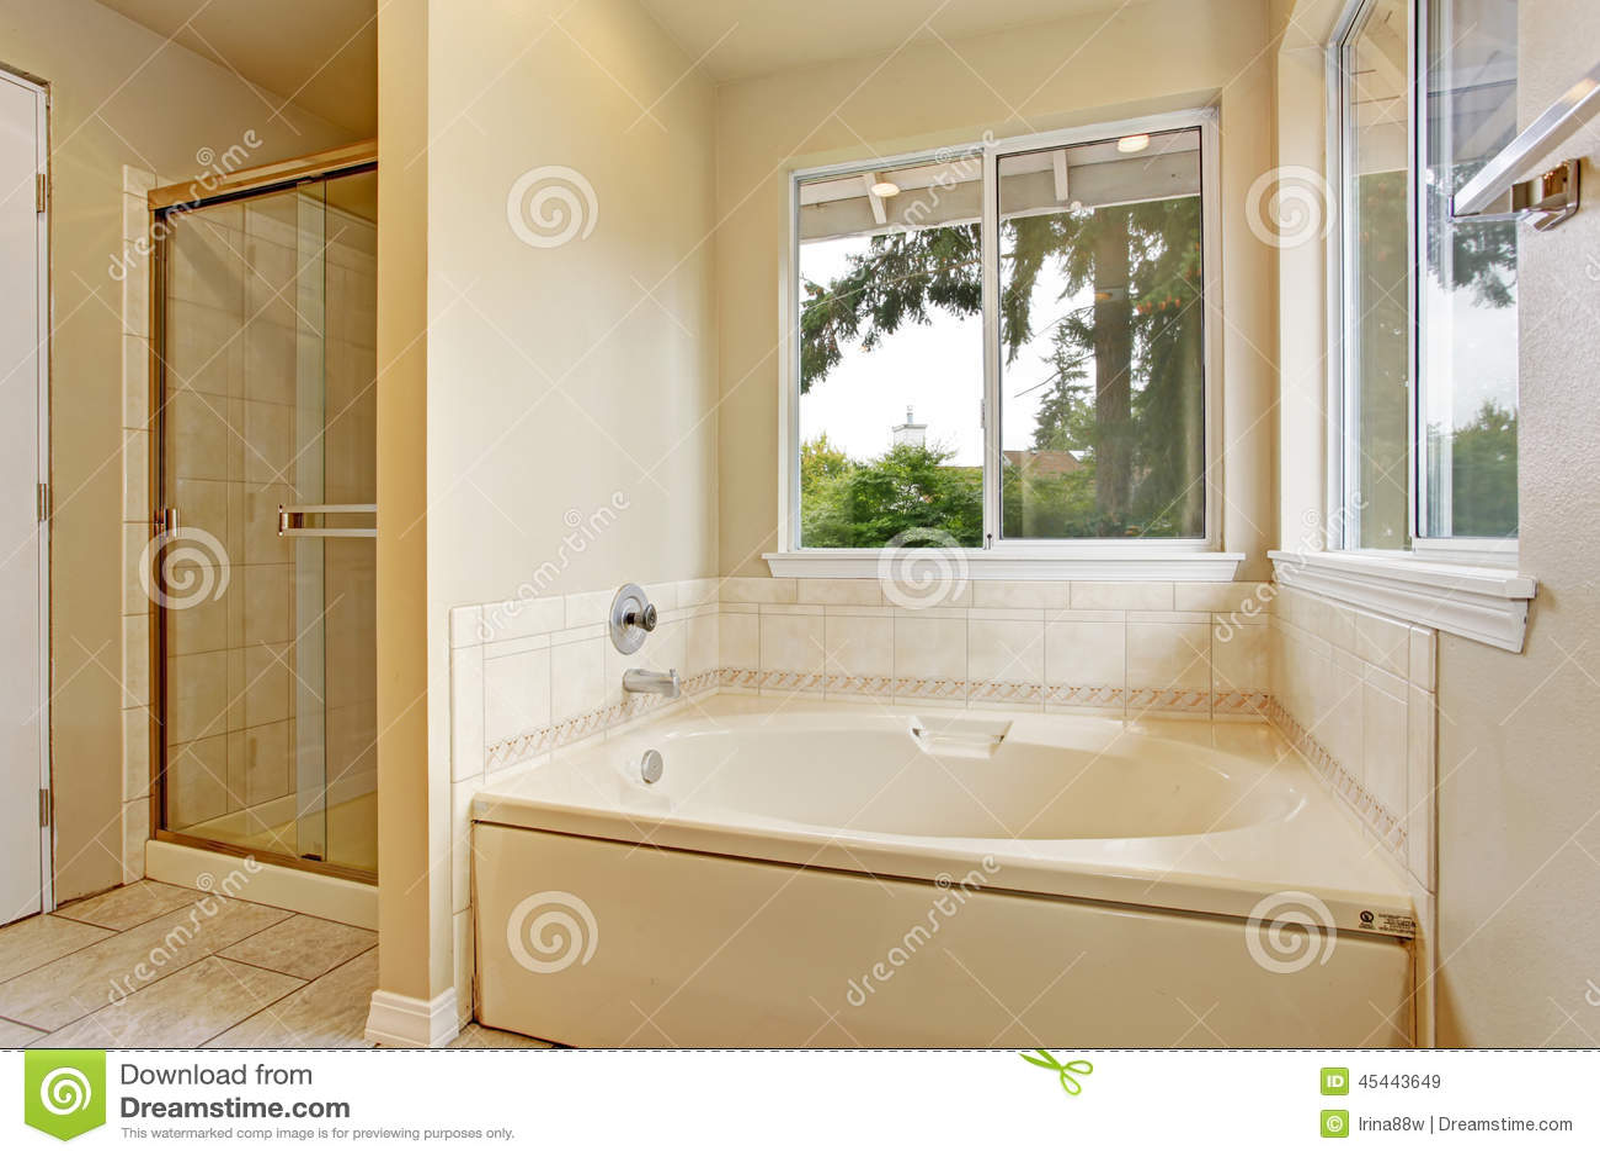 Tinas De Baño Con Ducha:Bathroom Windows Over Tubs with Shower